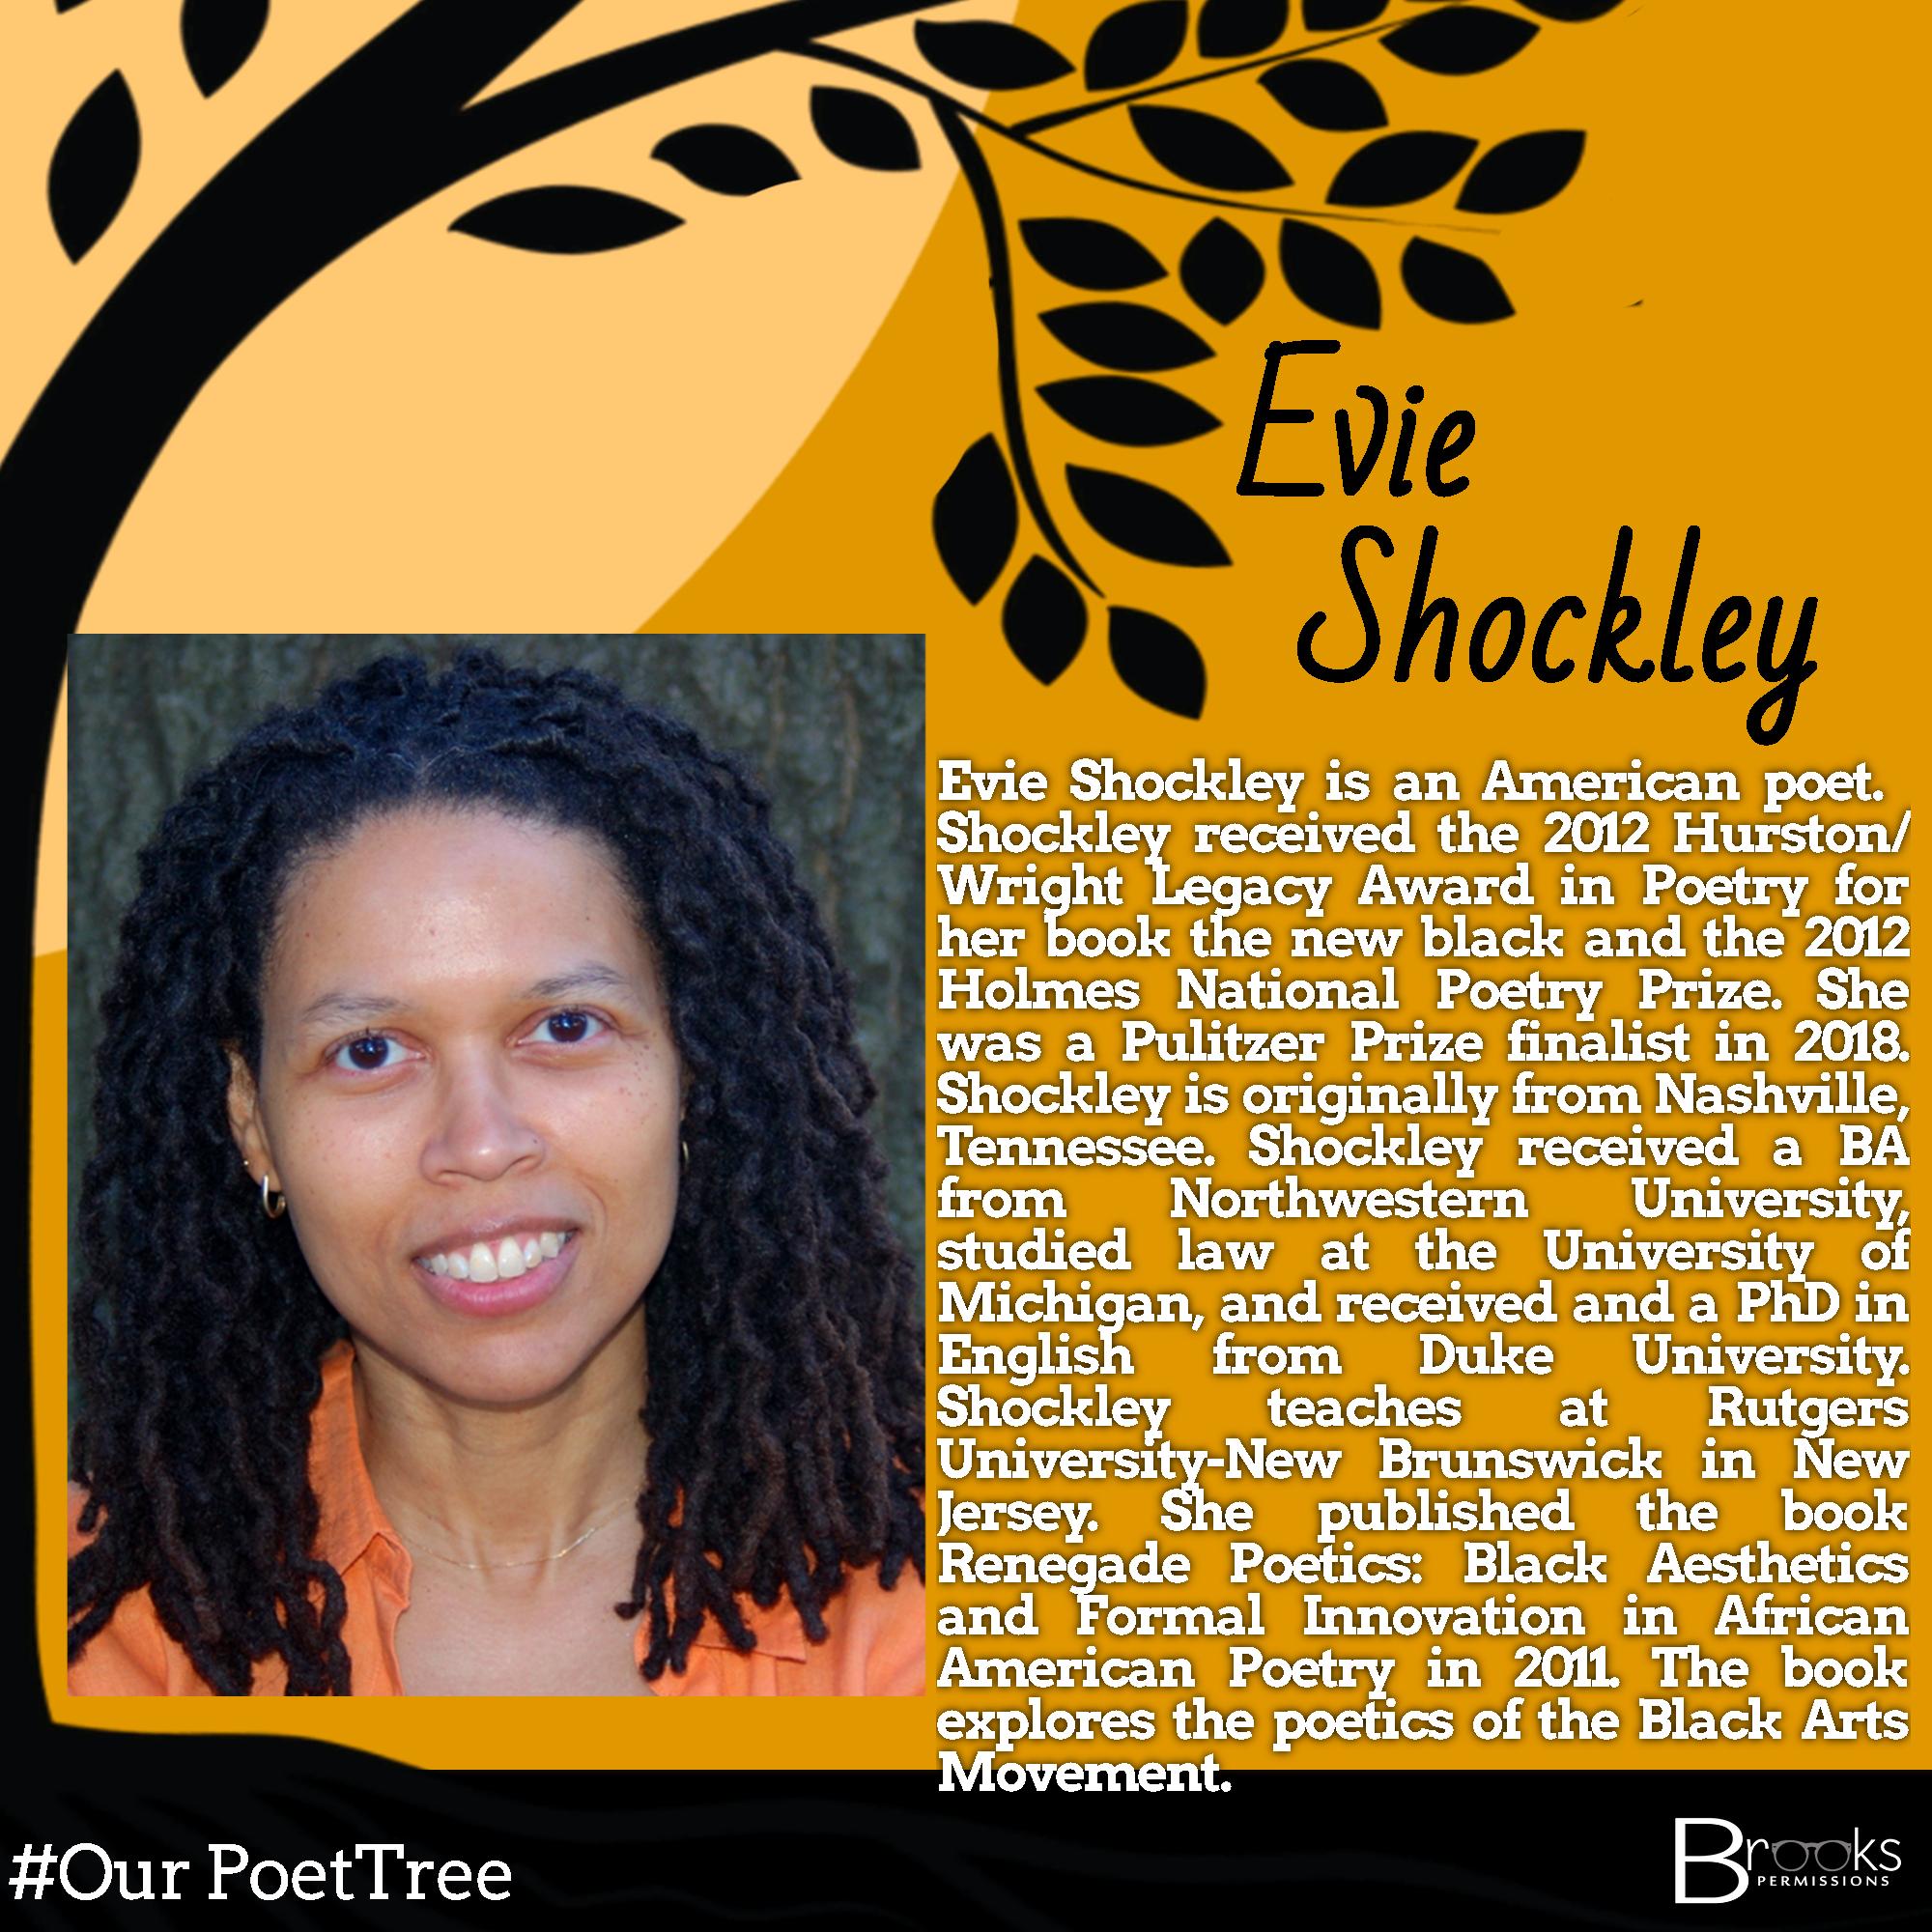 EvieShockley